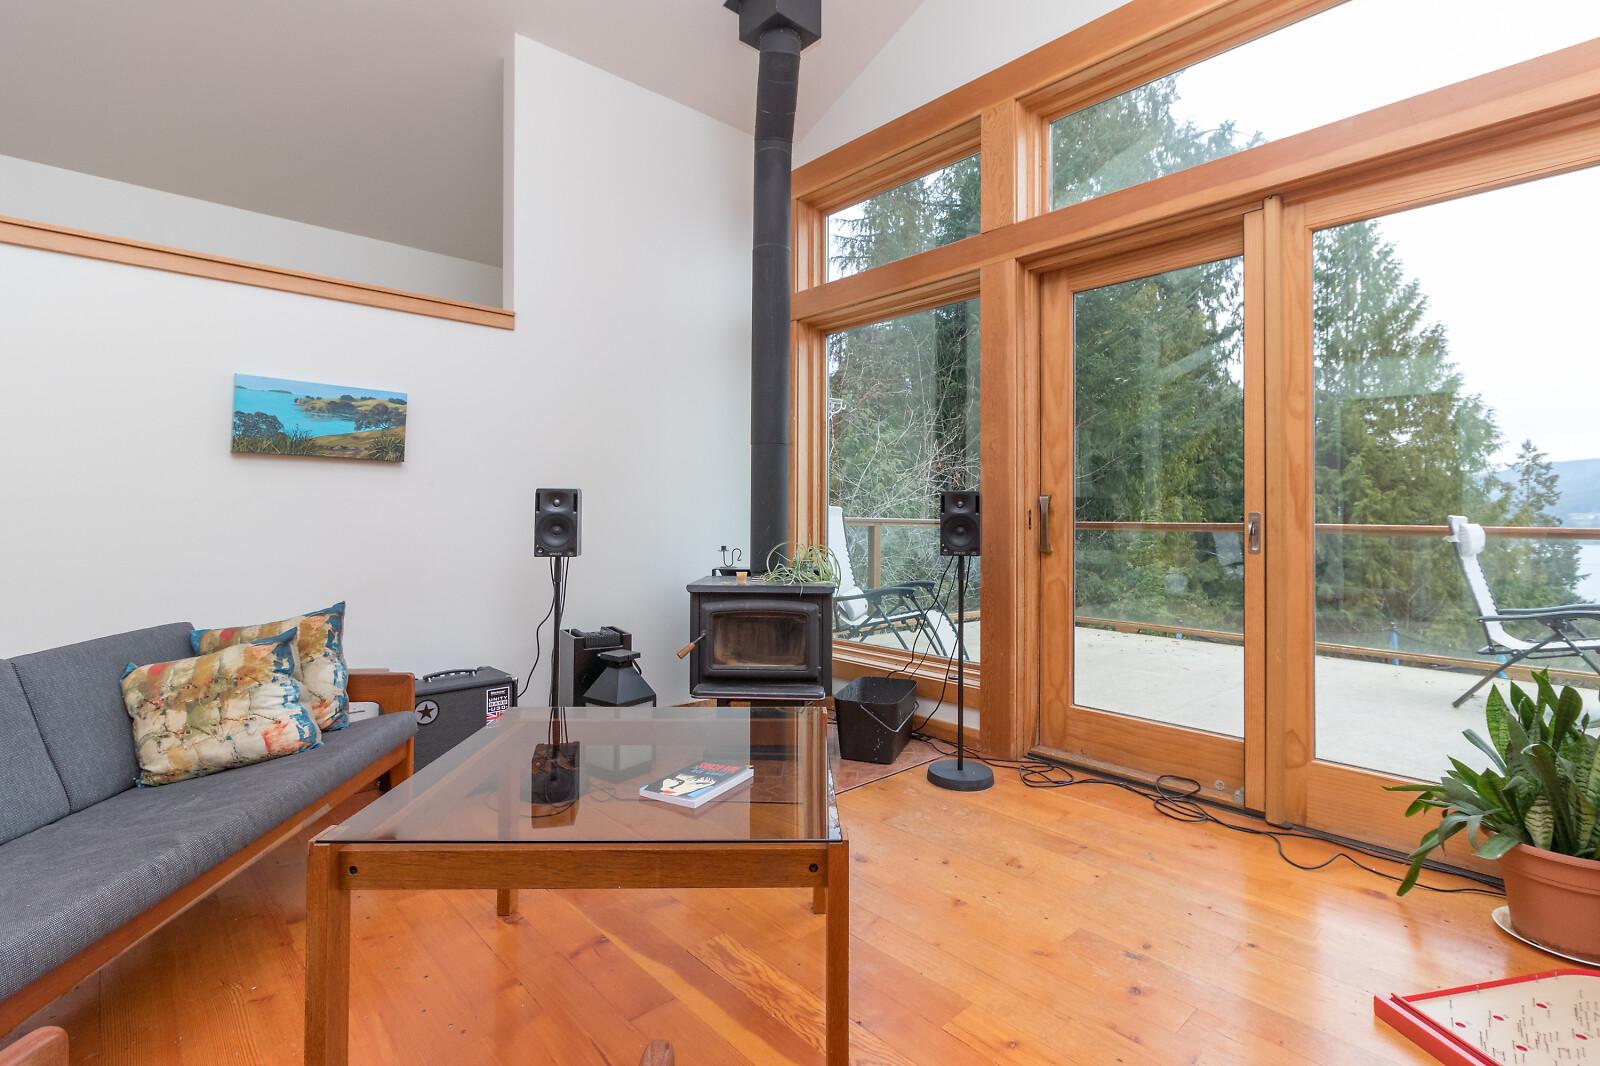 4362 Brentview Dr, Cowichan Bay, British Columbia  V0R 1N2 - Photo 4 - 868691